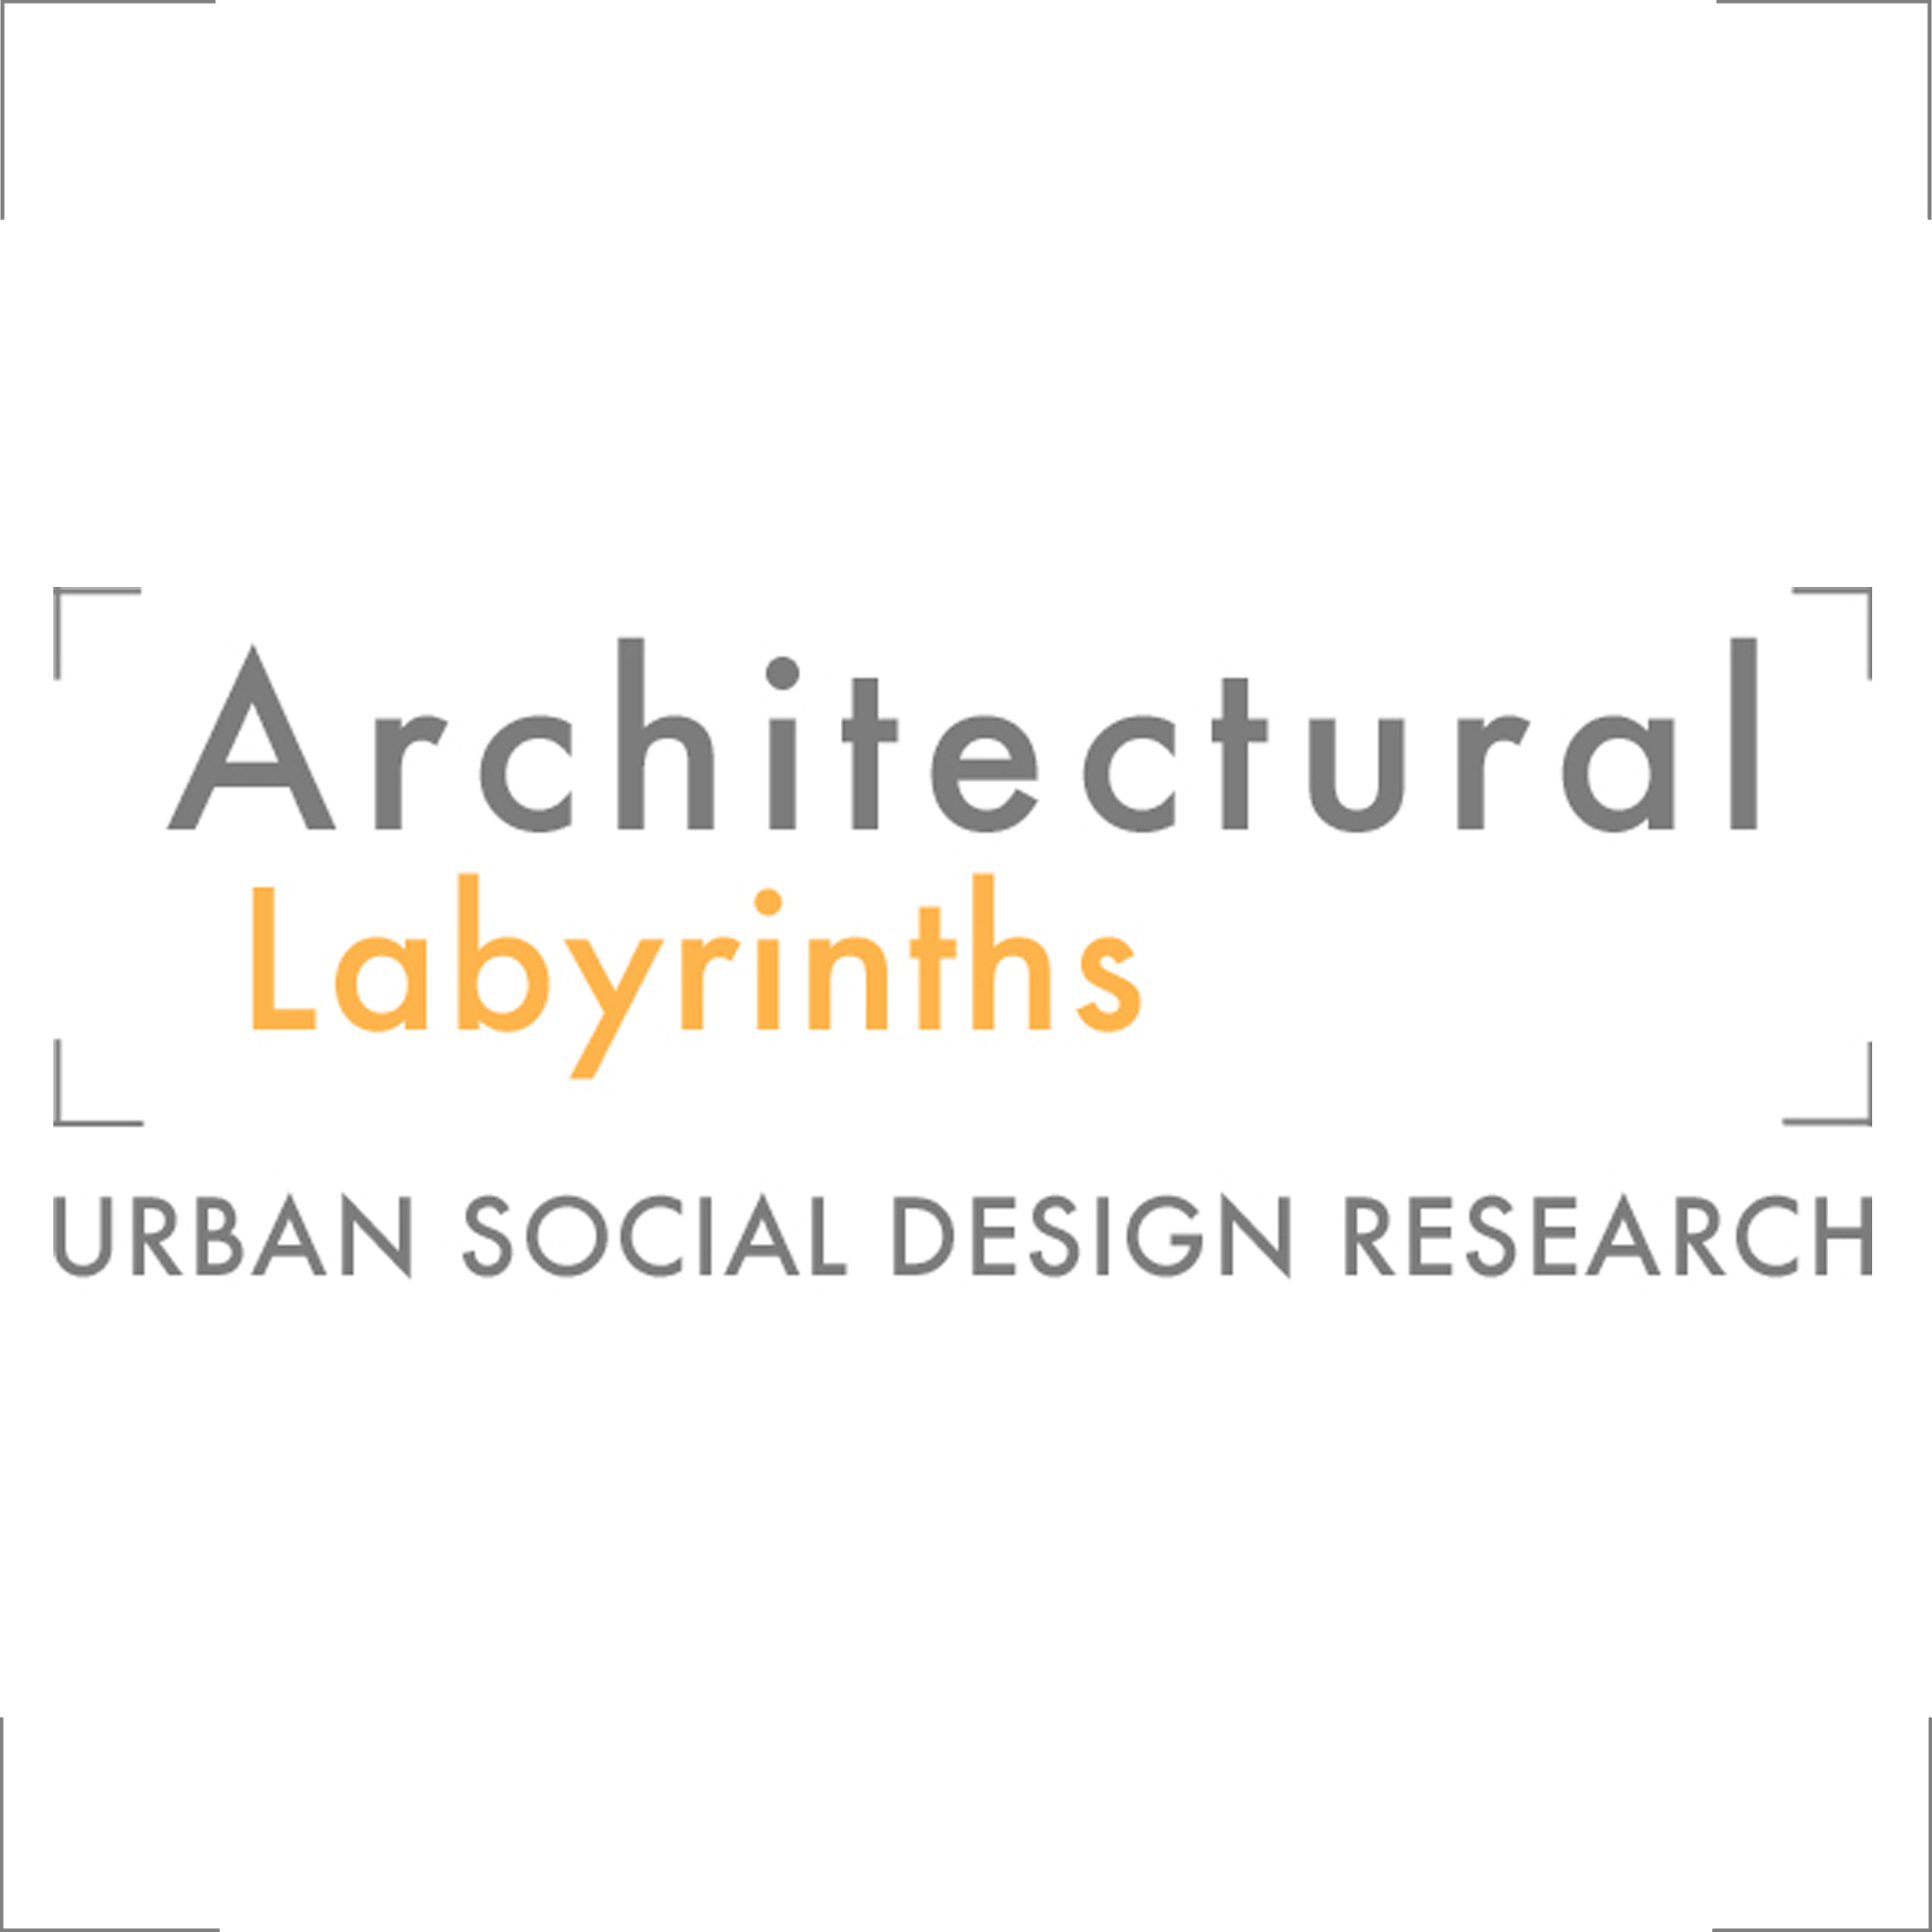 Architectural Labyrinths site logo